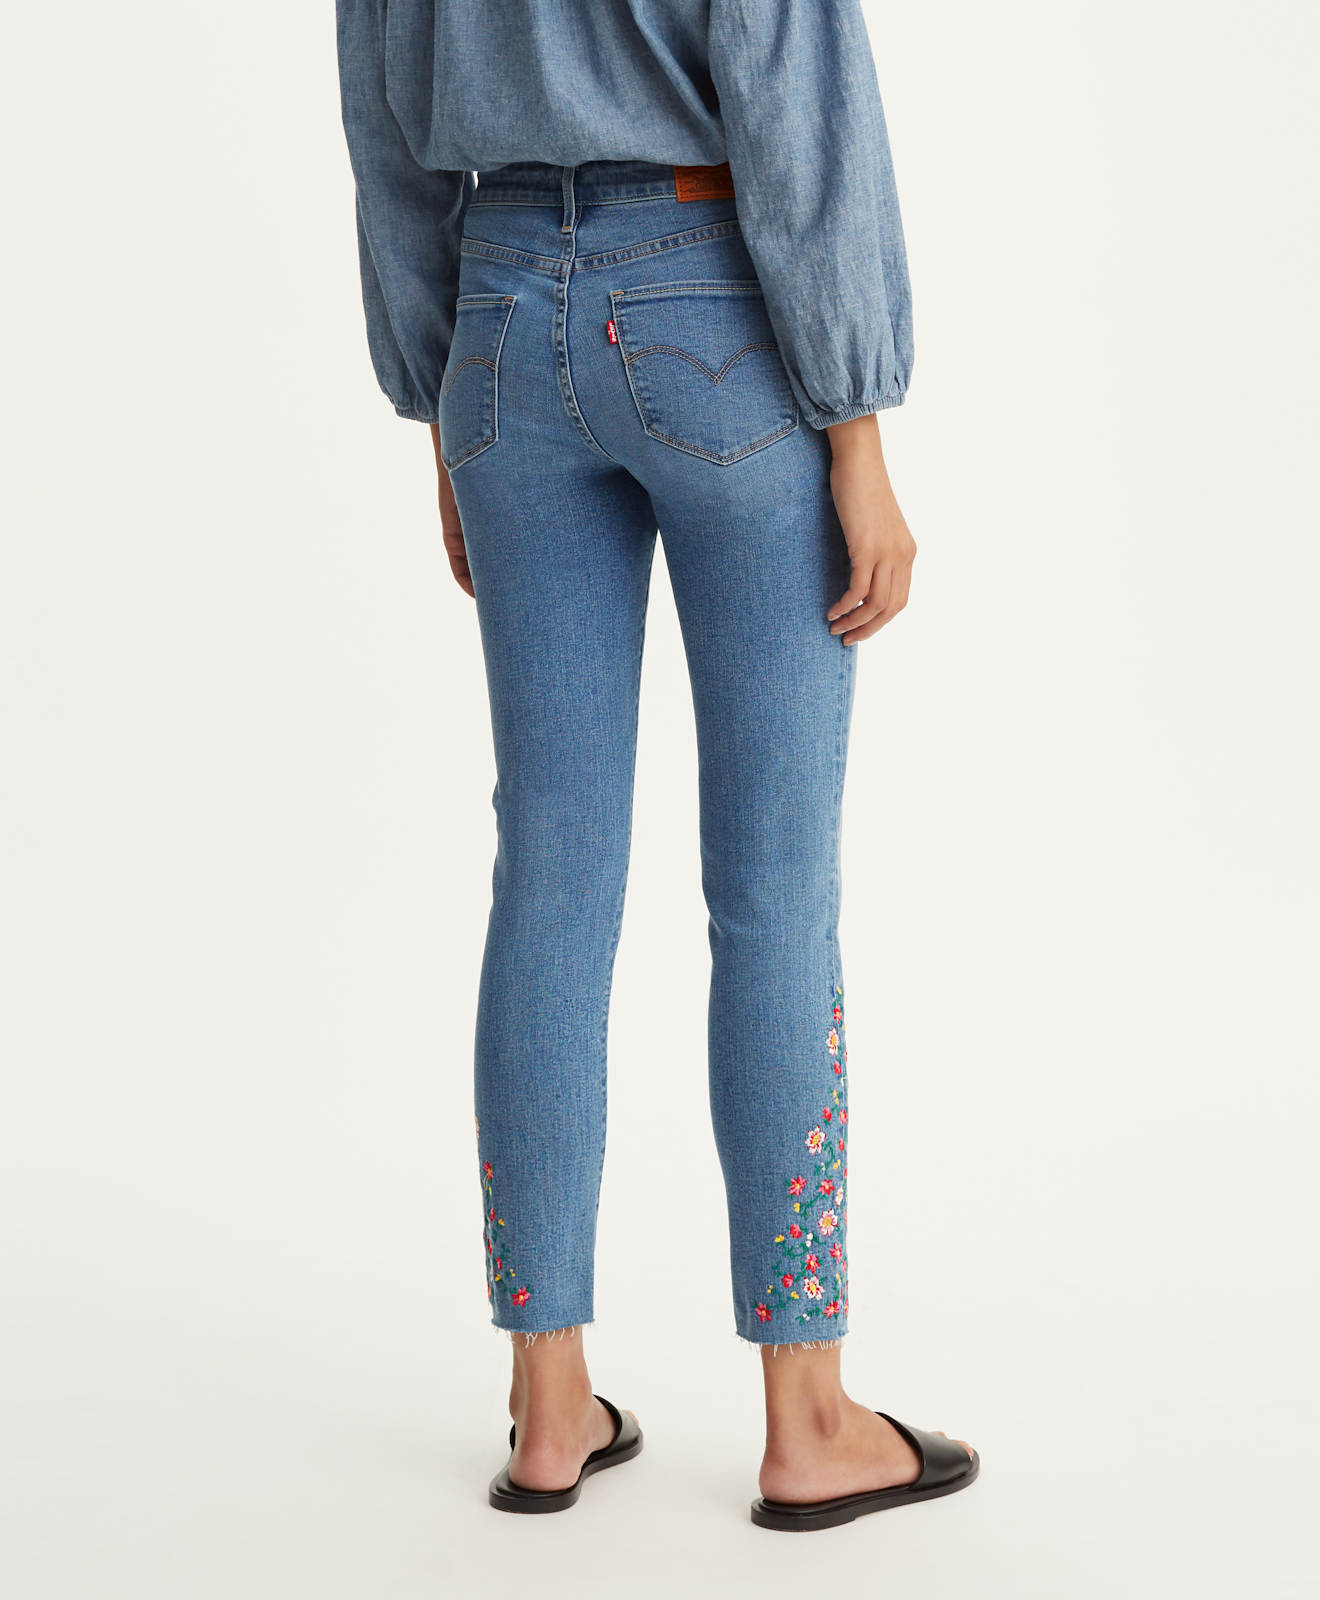 Jeans Cheville Neu Tout Haute Taille femme Aller Skinny Levi´s ® Original Tuyau dehors 721 8OqyEH